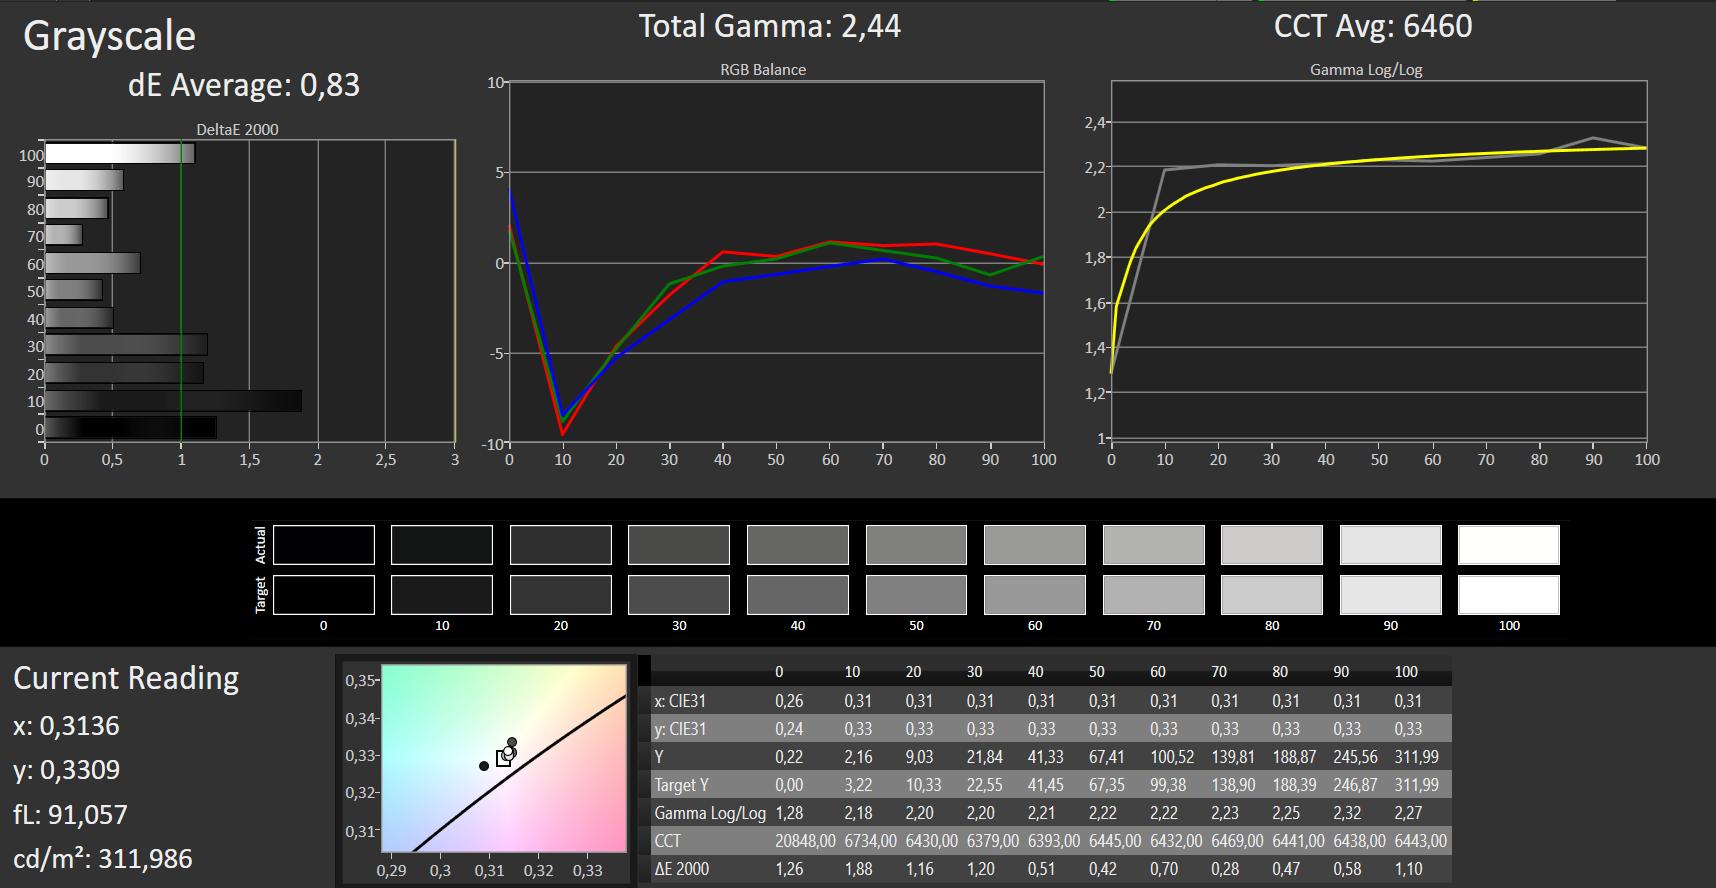 ASUS TUF Gaming FX705DY (Ryzen 5 3550H, Radeon RX 560X, SSD, FHD